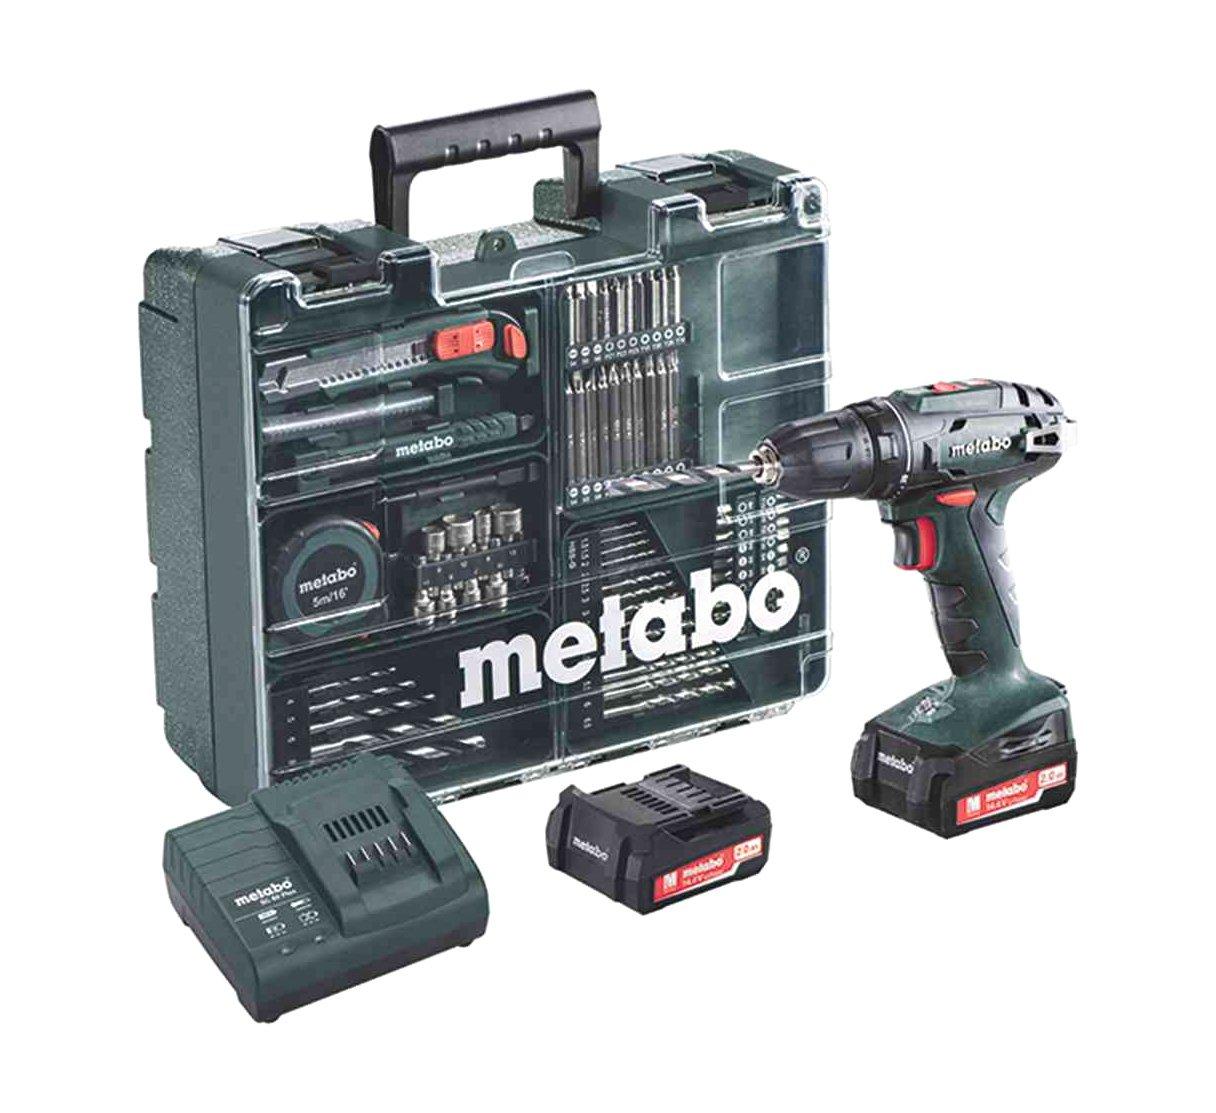 Metabo-60220688-144-Set-Workshop-74-Acc-BS-144-Mobile-Werkstatt-20-Ah-10-mm-SC-60-Plus-144-V